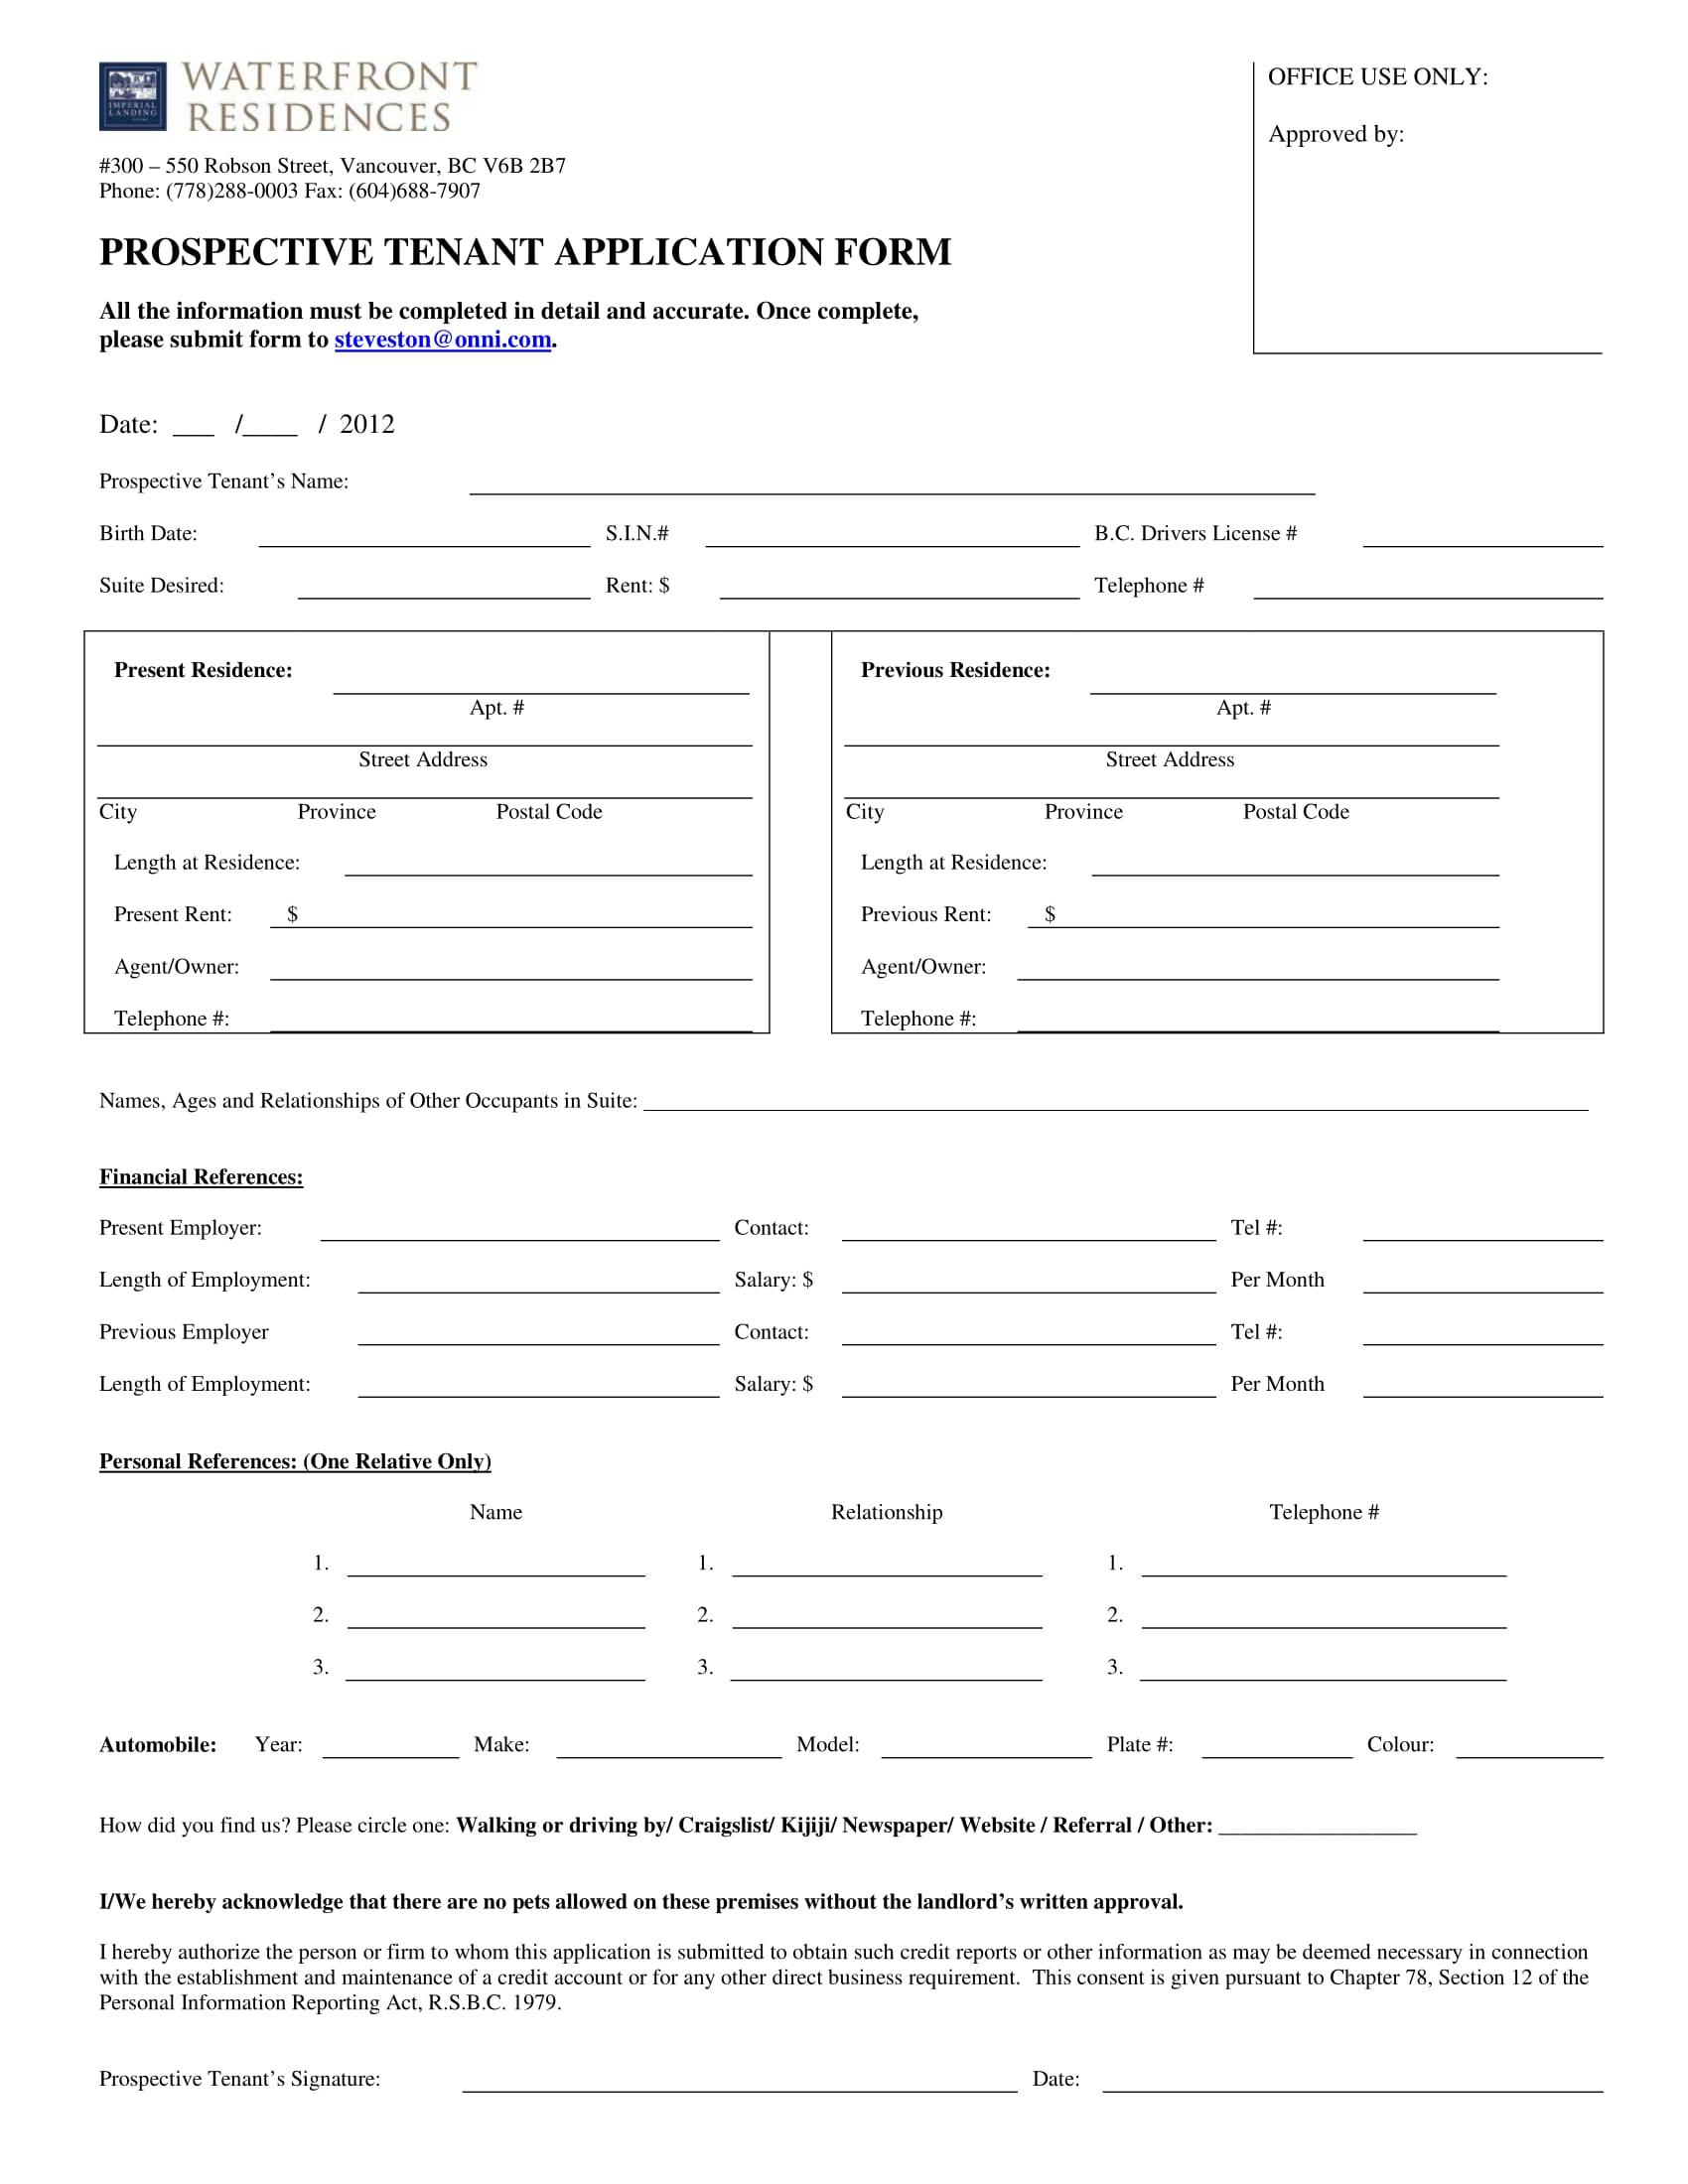 prospective tenant application form 1